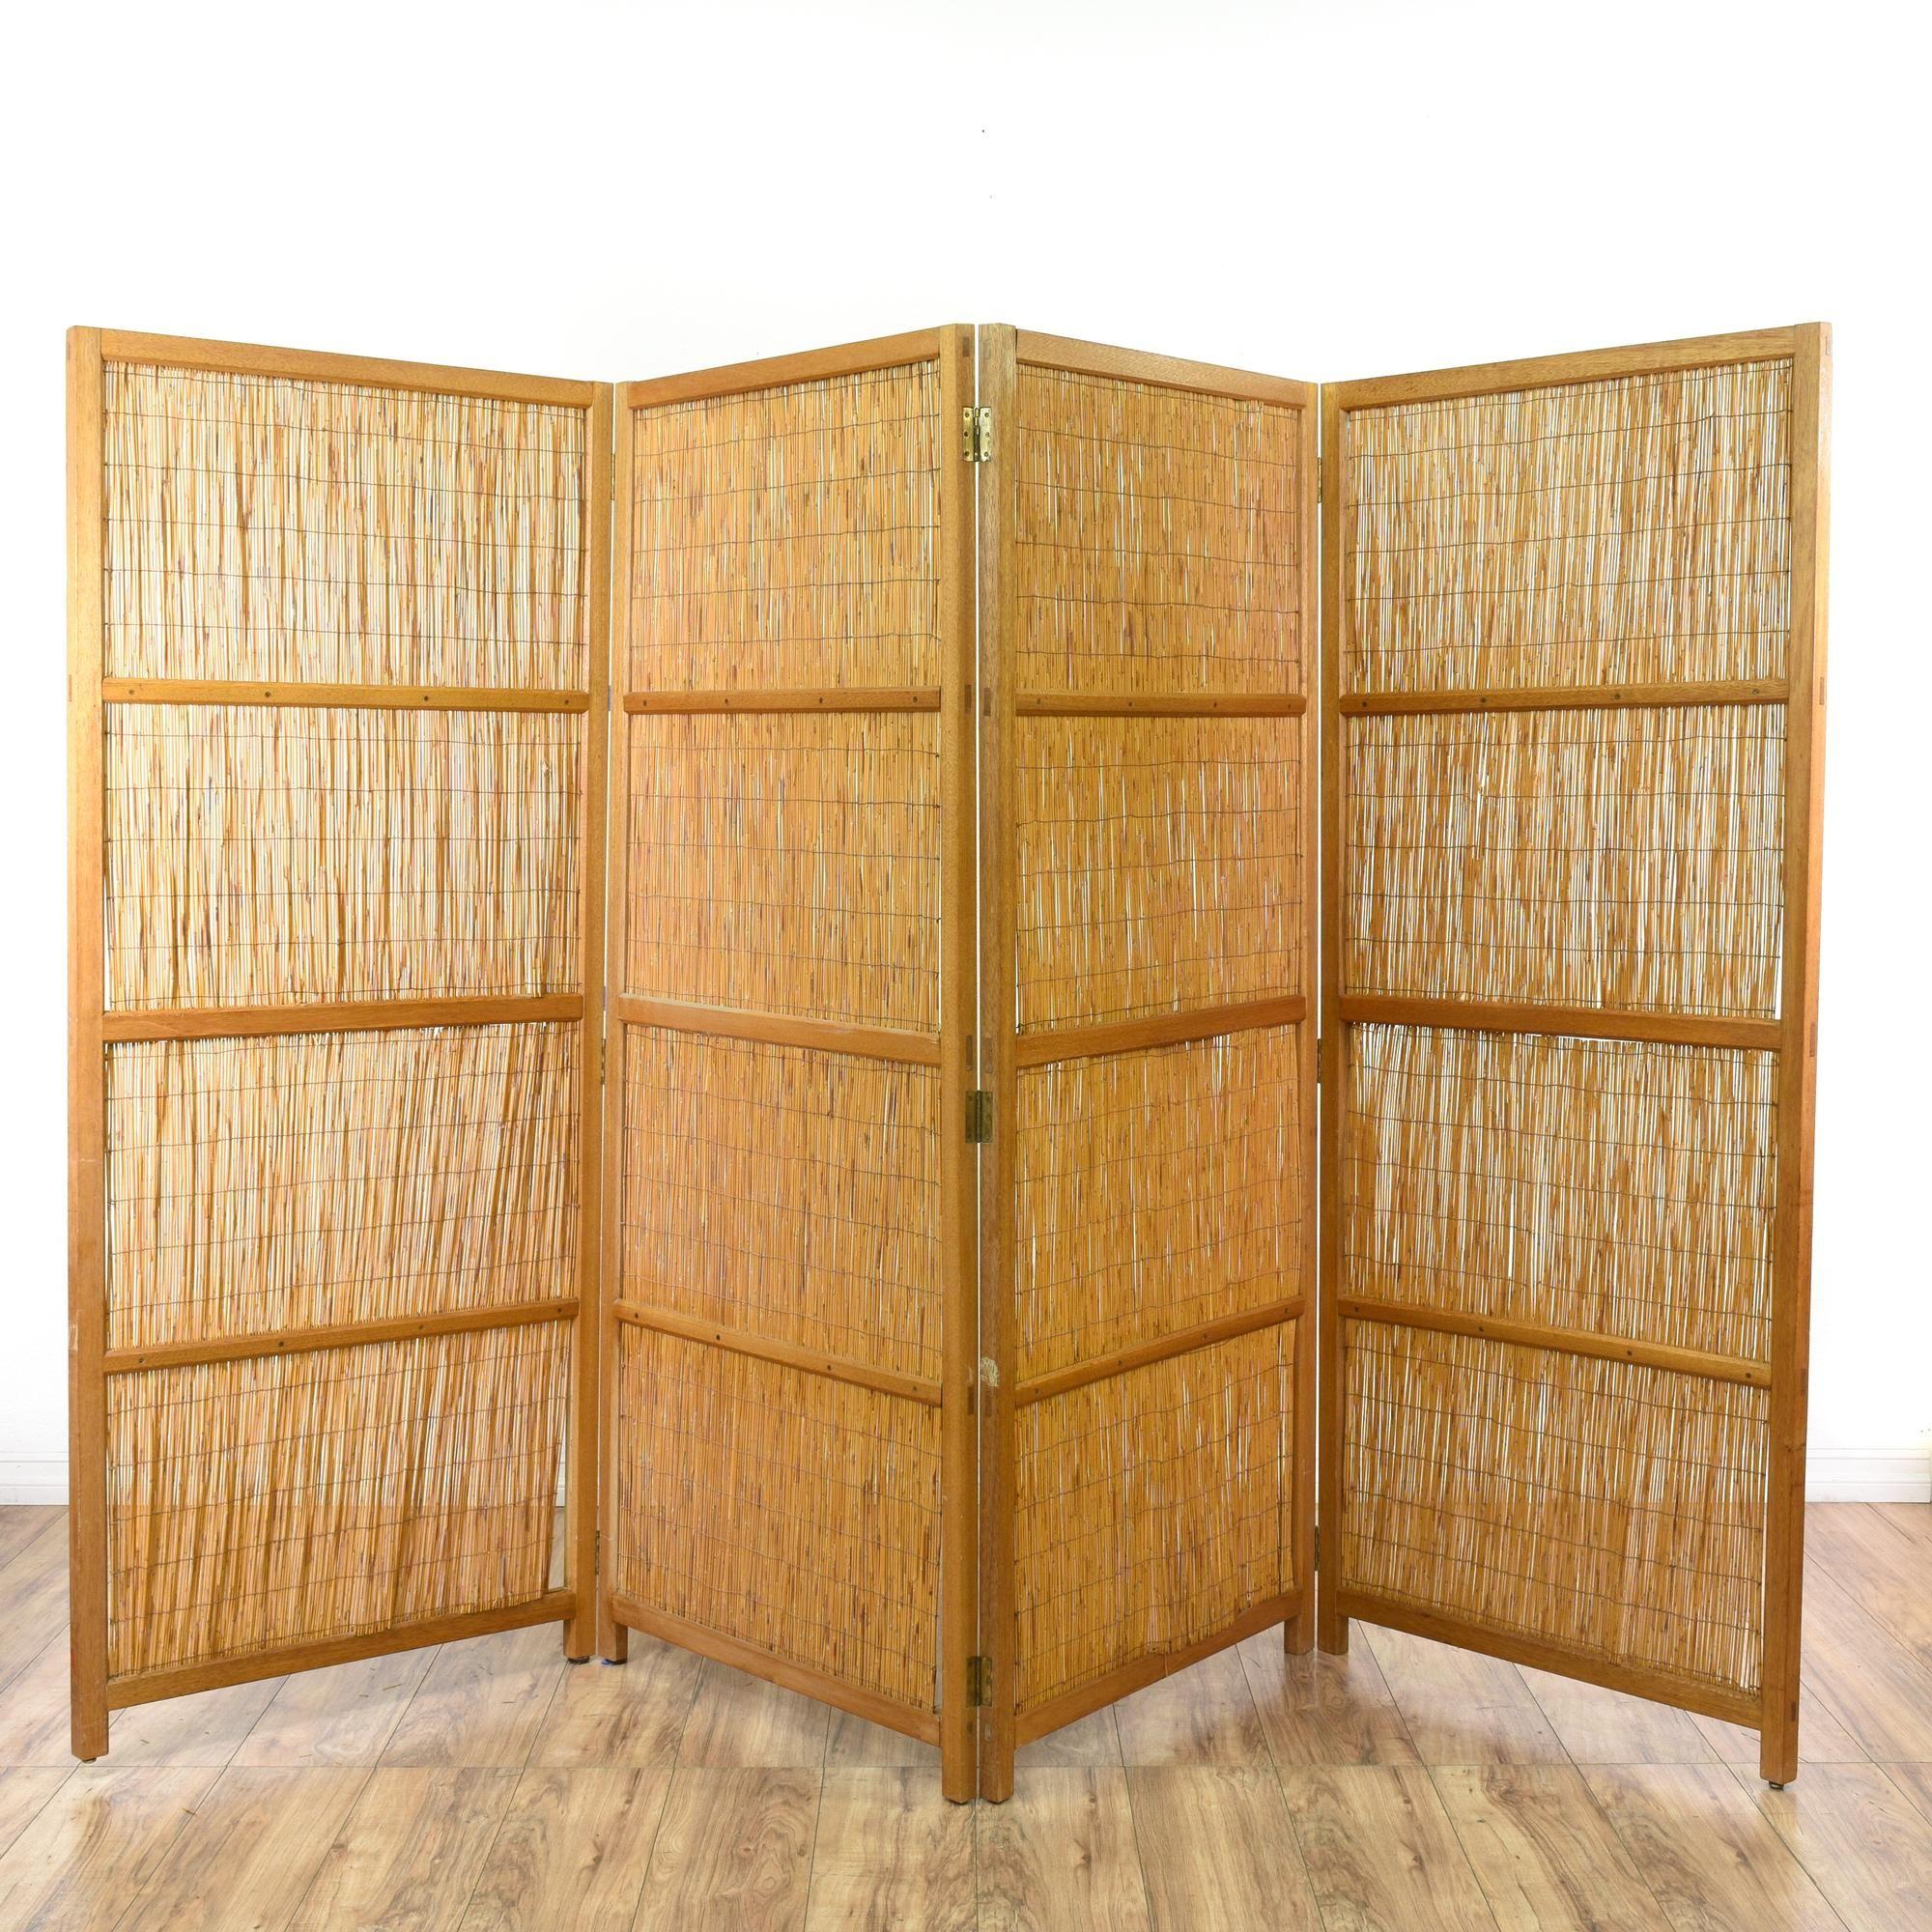 Large wood u bamboo room divider screen bamboo room divider room